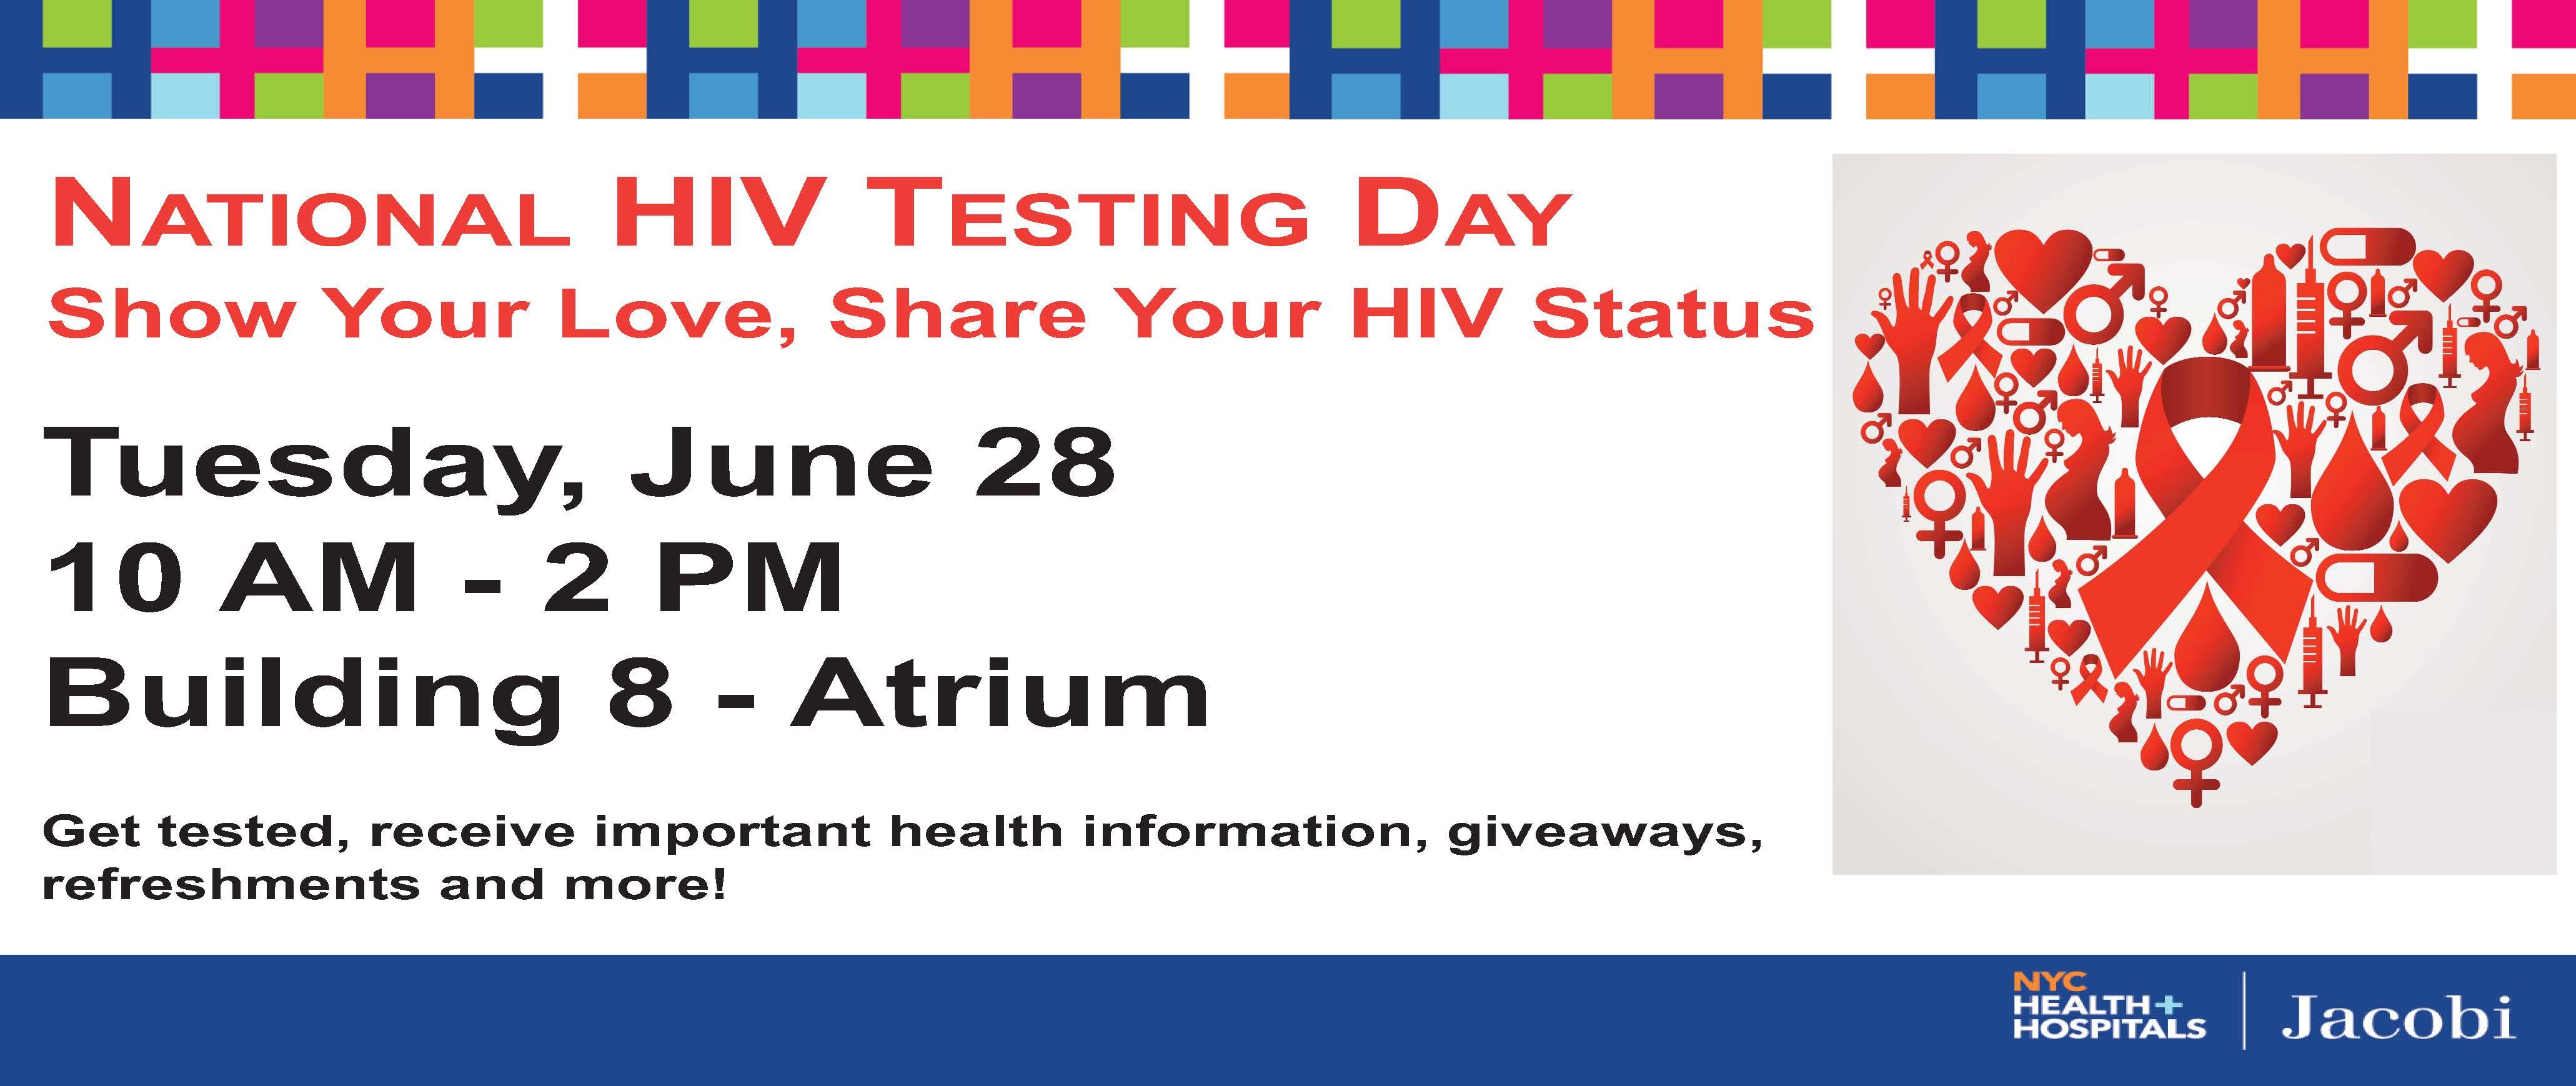 hiv-testing-slide (003)